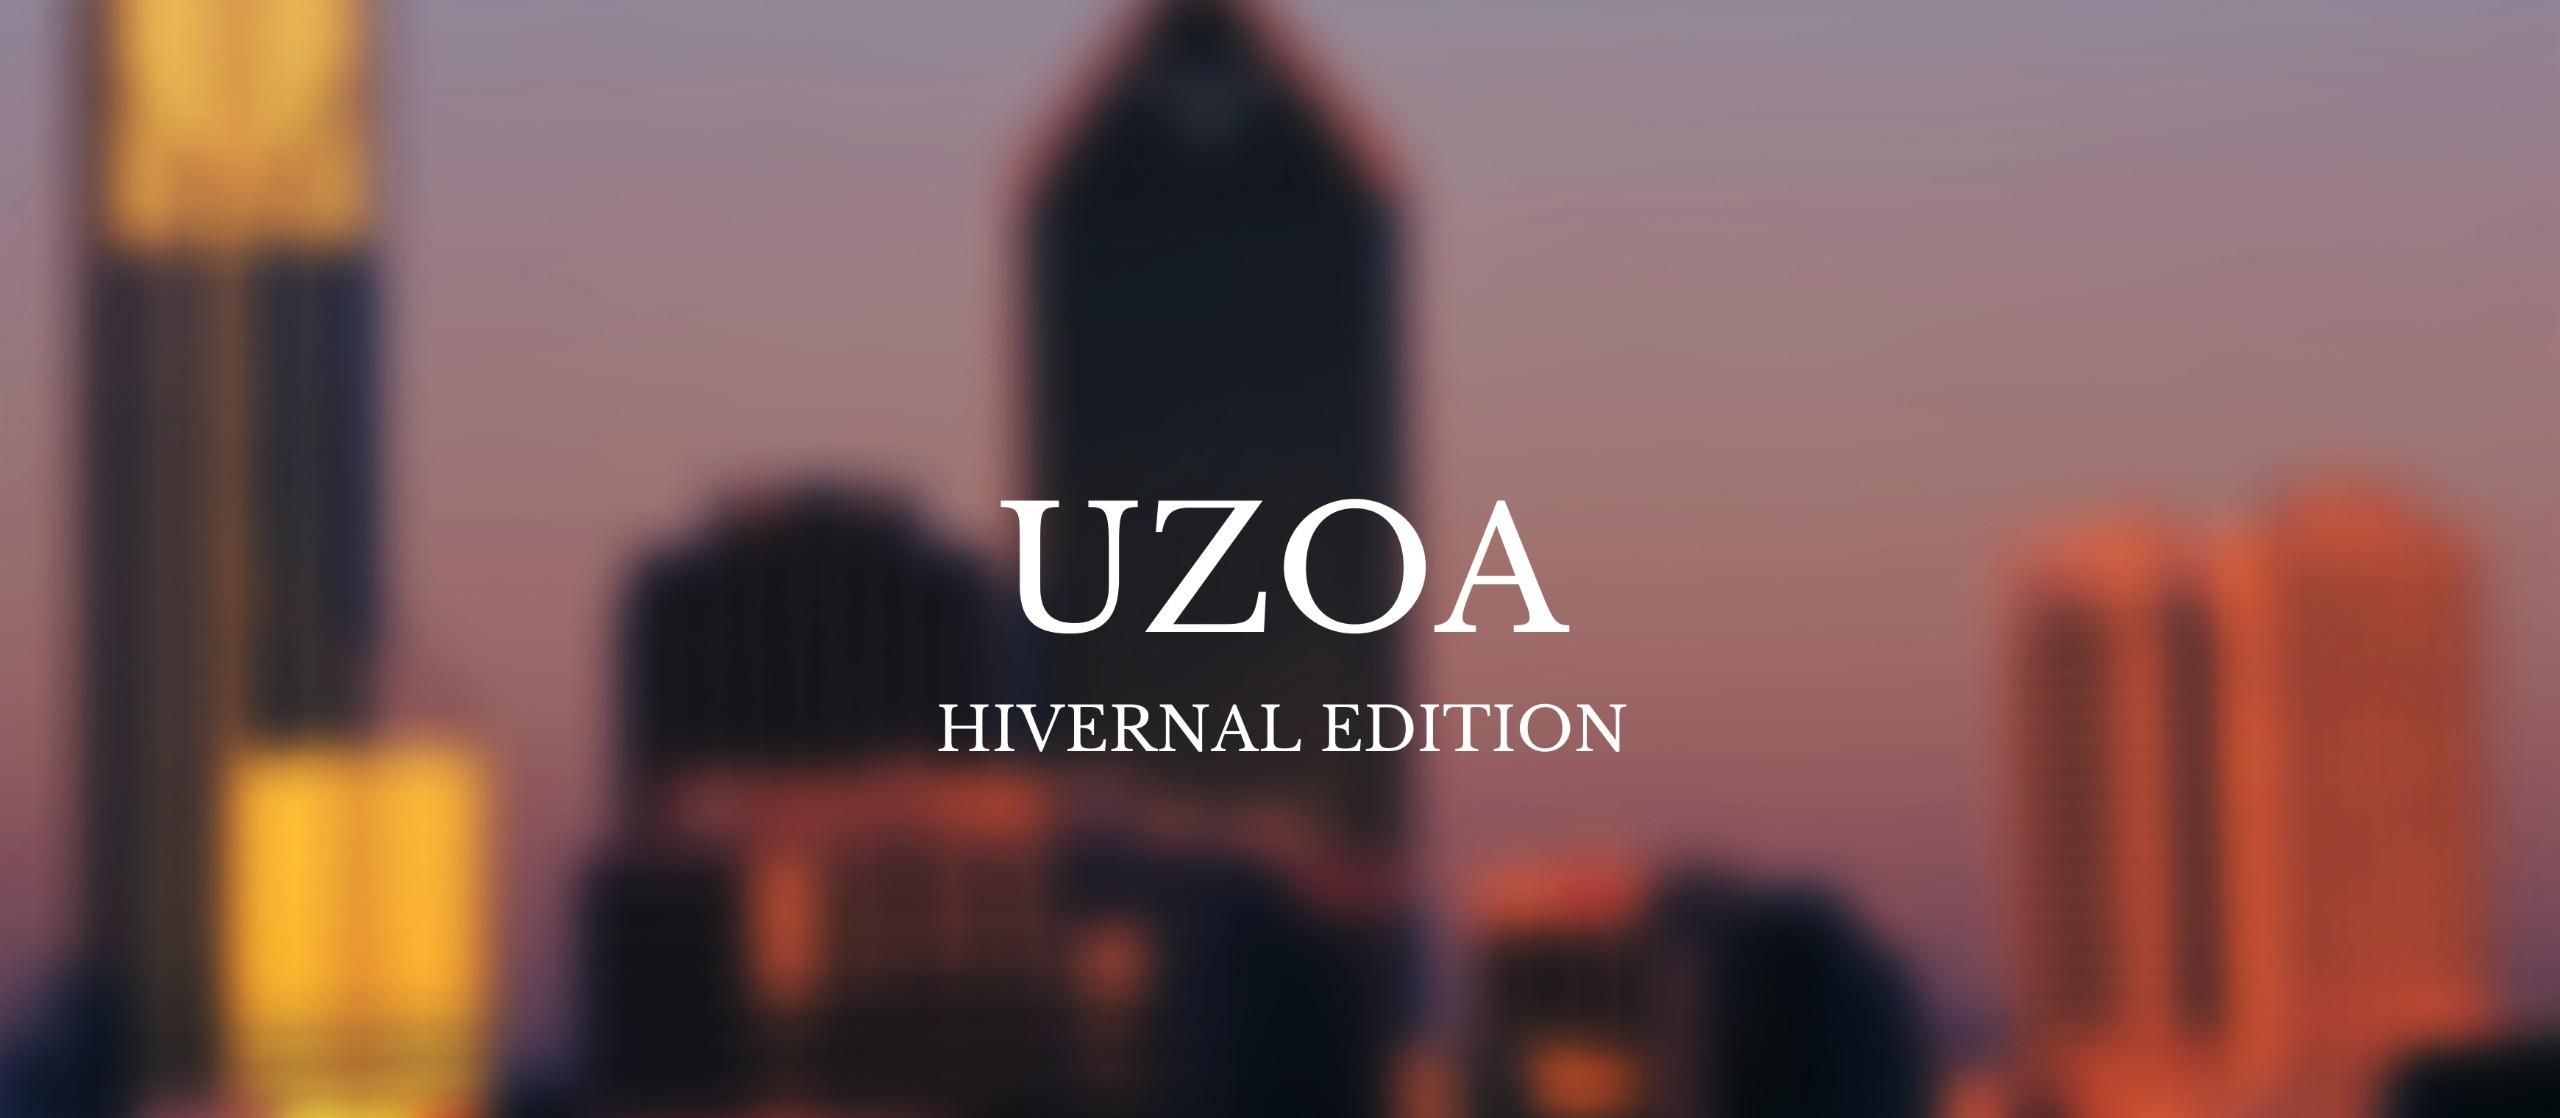 U (@uzoa) Cover Image